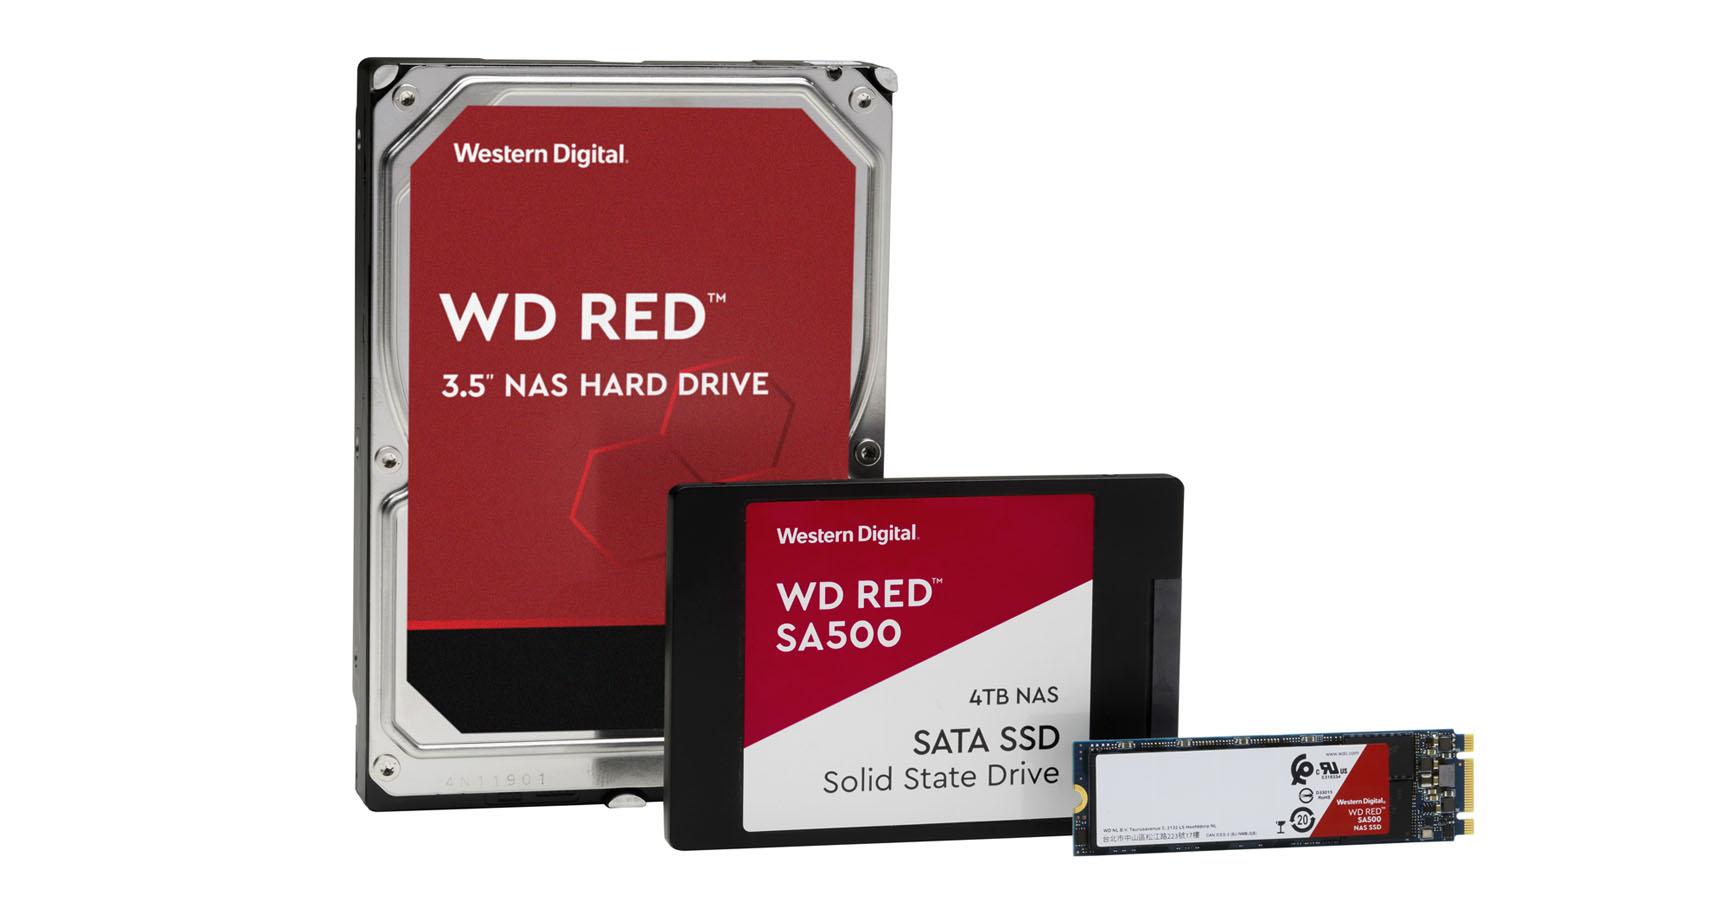 WD Red Pro HD SSD NAS Western Digital